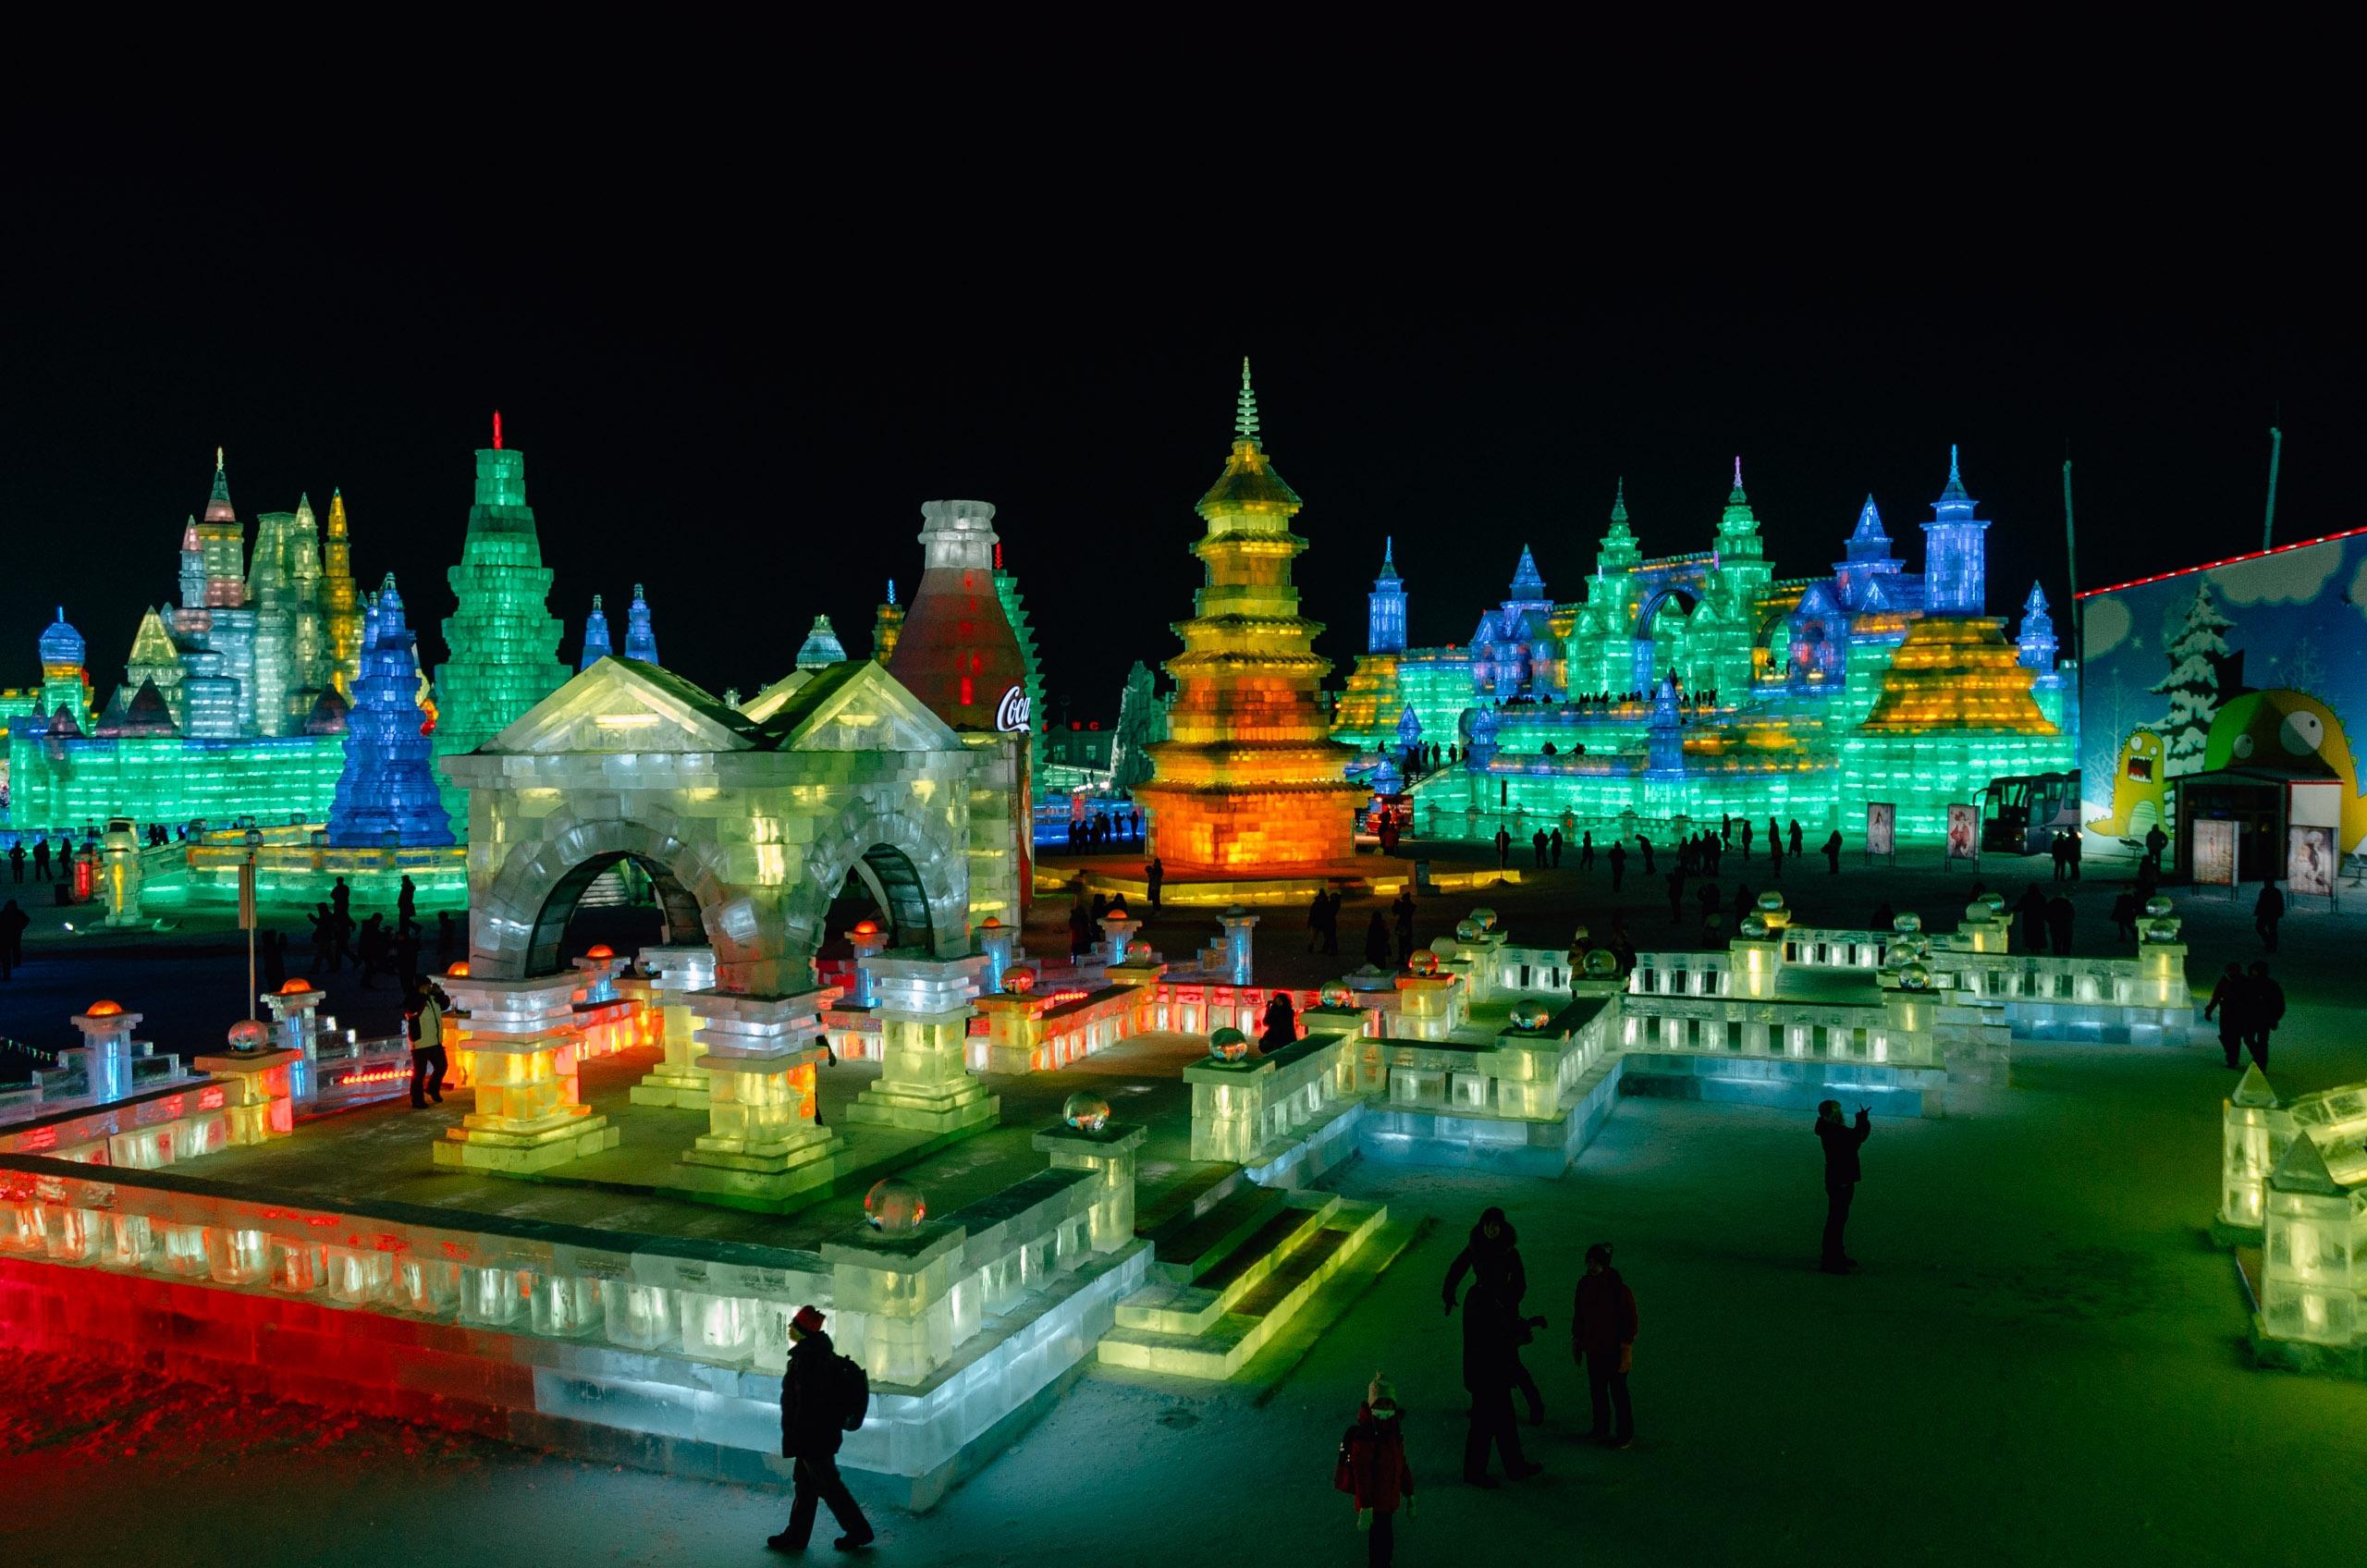 Harbin China Ice Festival - 2012-0108-DSC_2081_94220